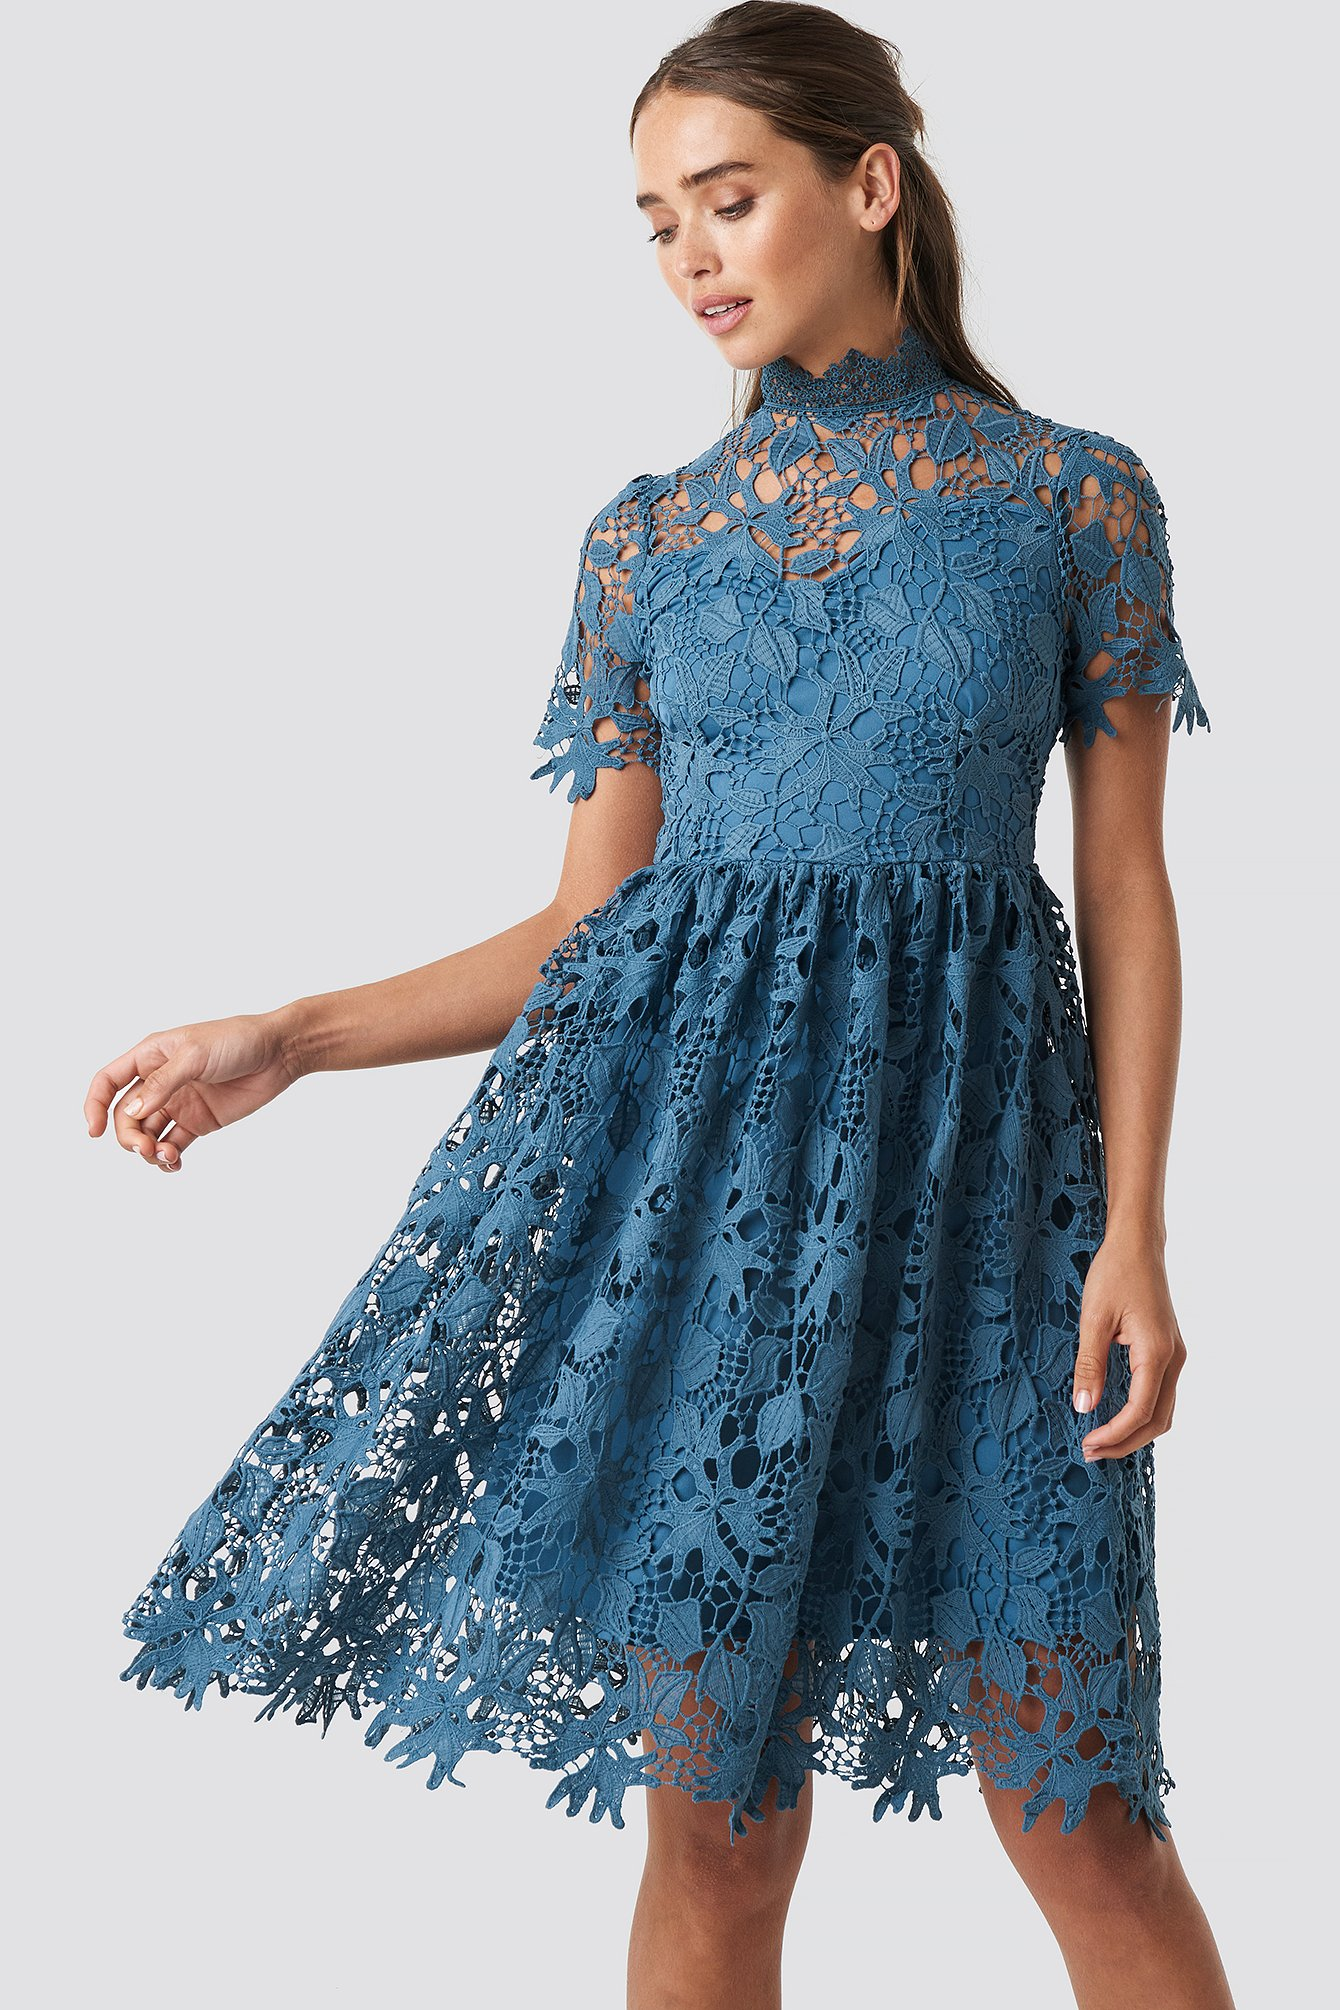 turquoise blau lace kleid shop a2835 174fa